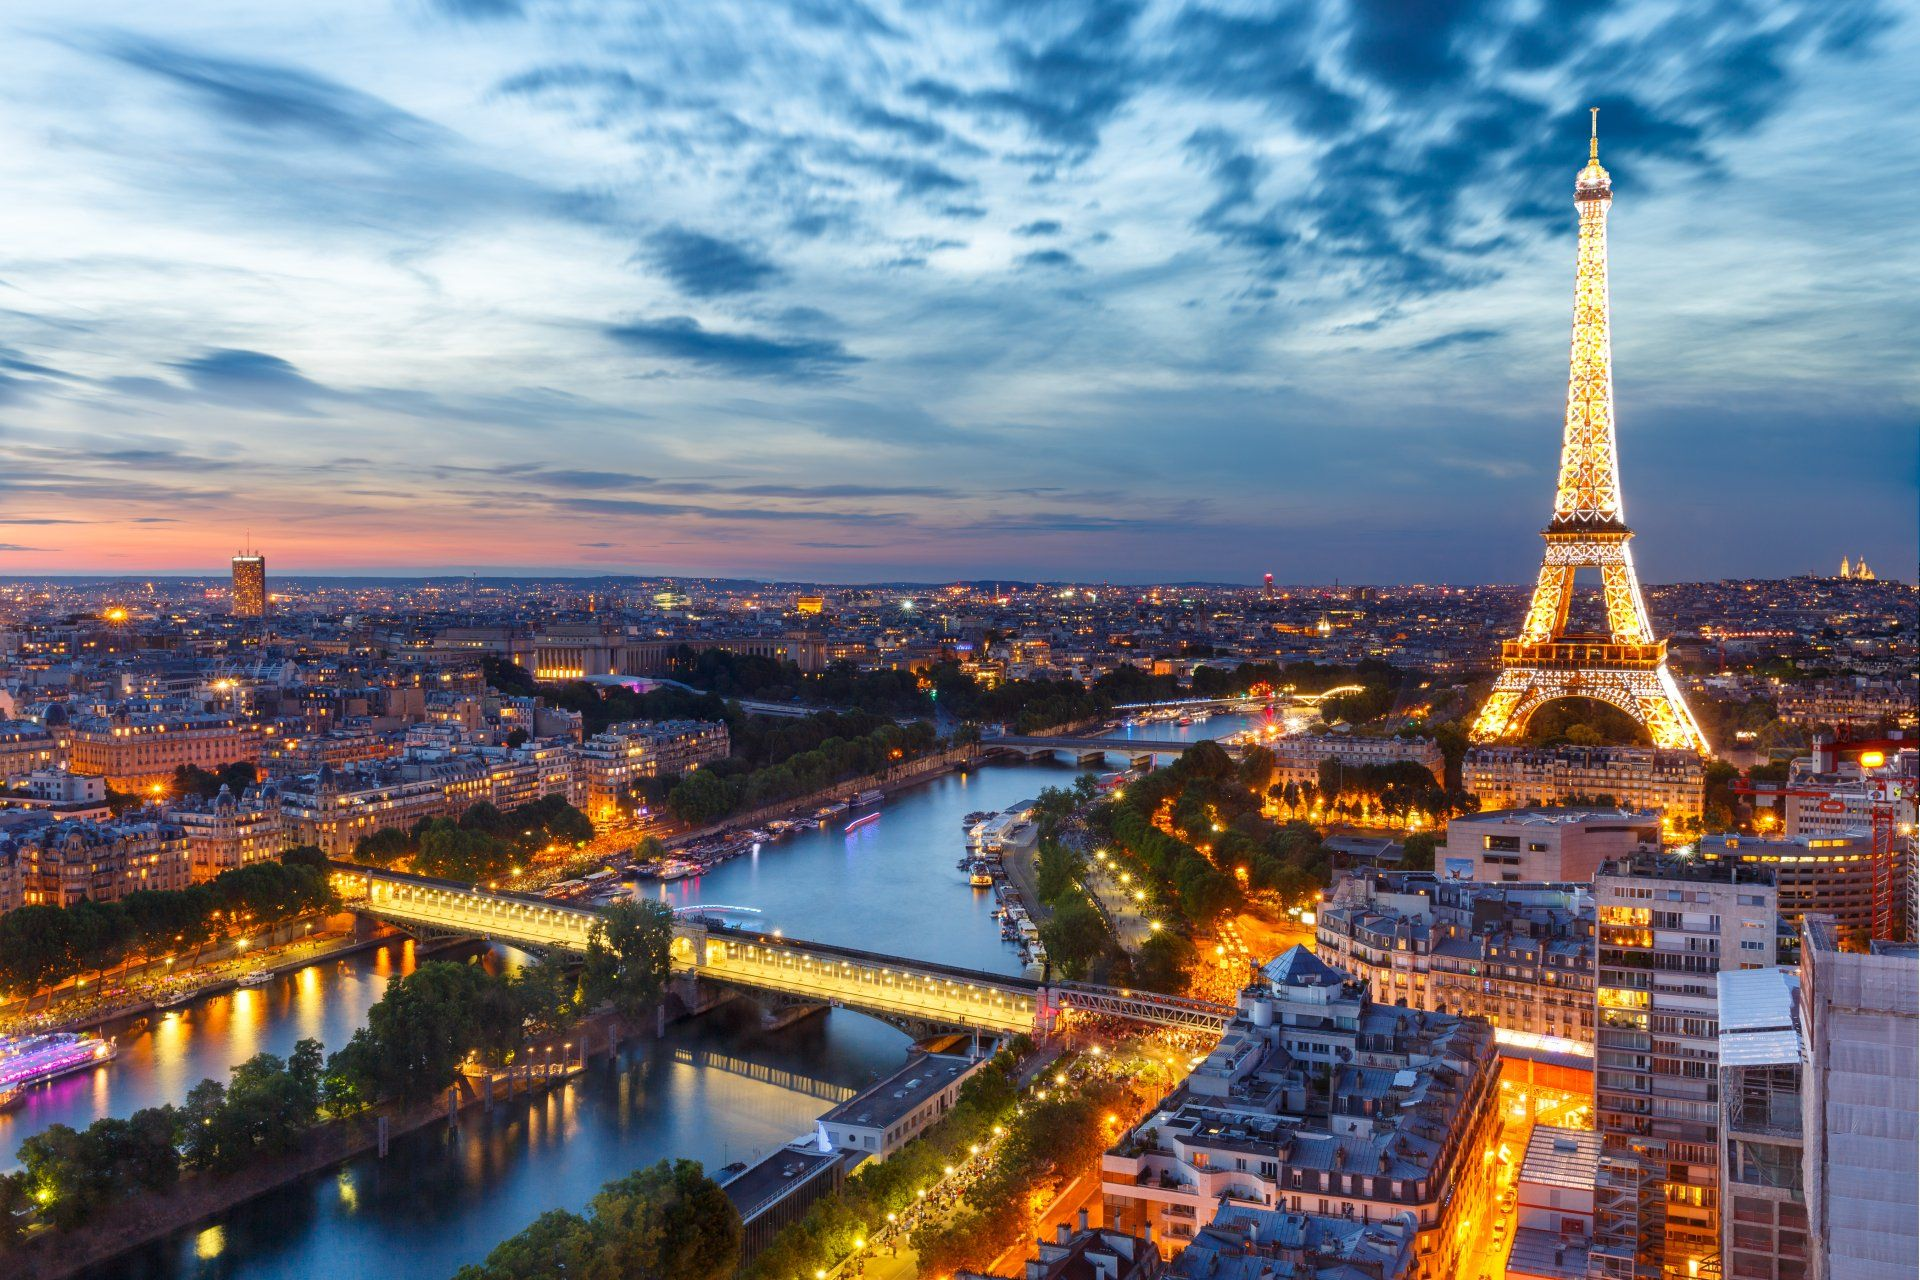 Man Made Paris Night Light Eiffel Tower City Cityscape France River Sky Horizon Building Wallpaper